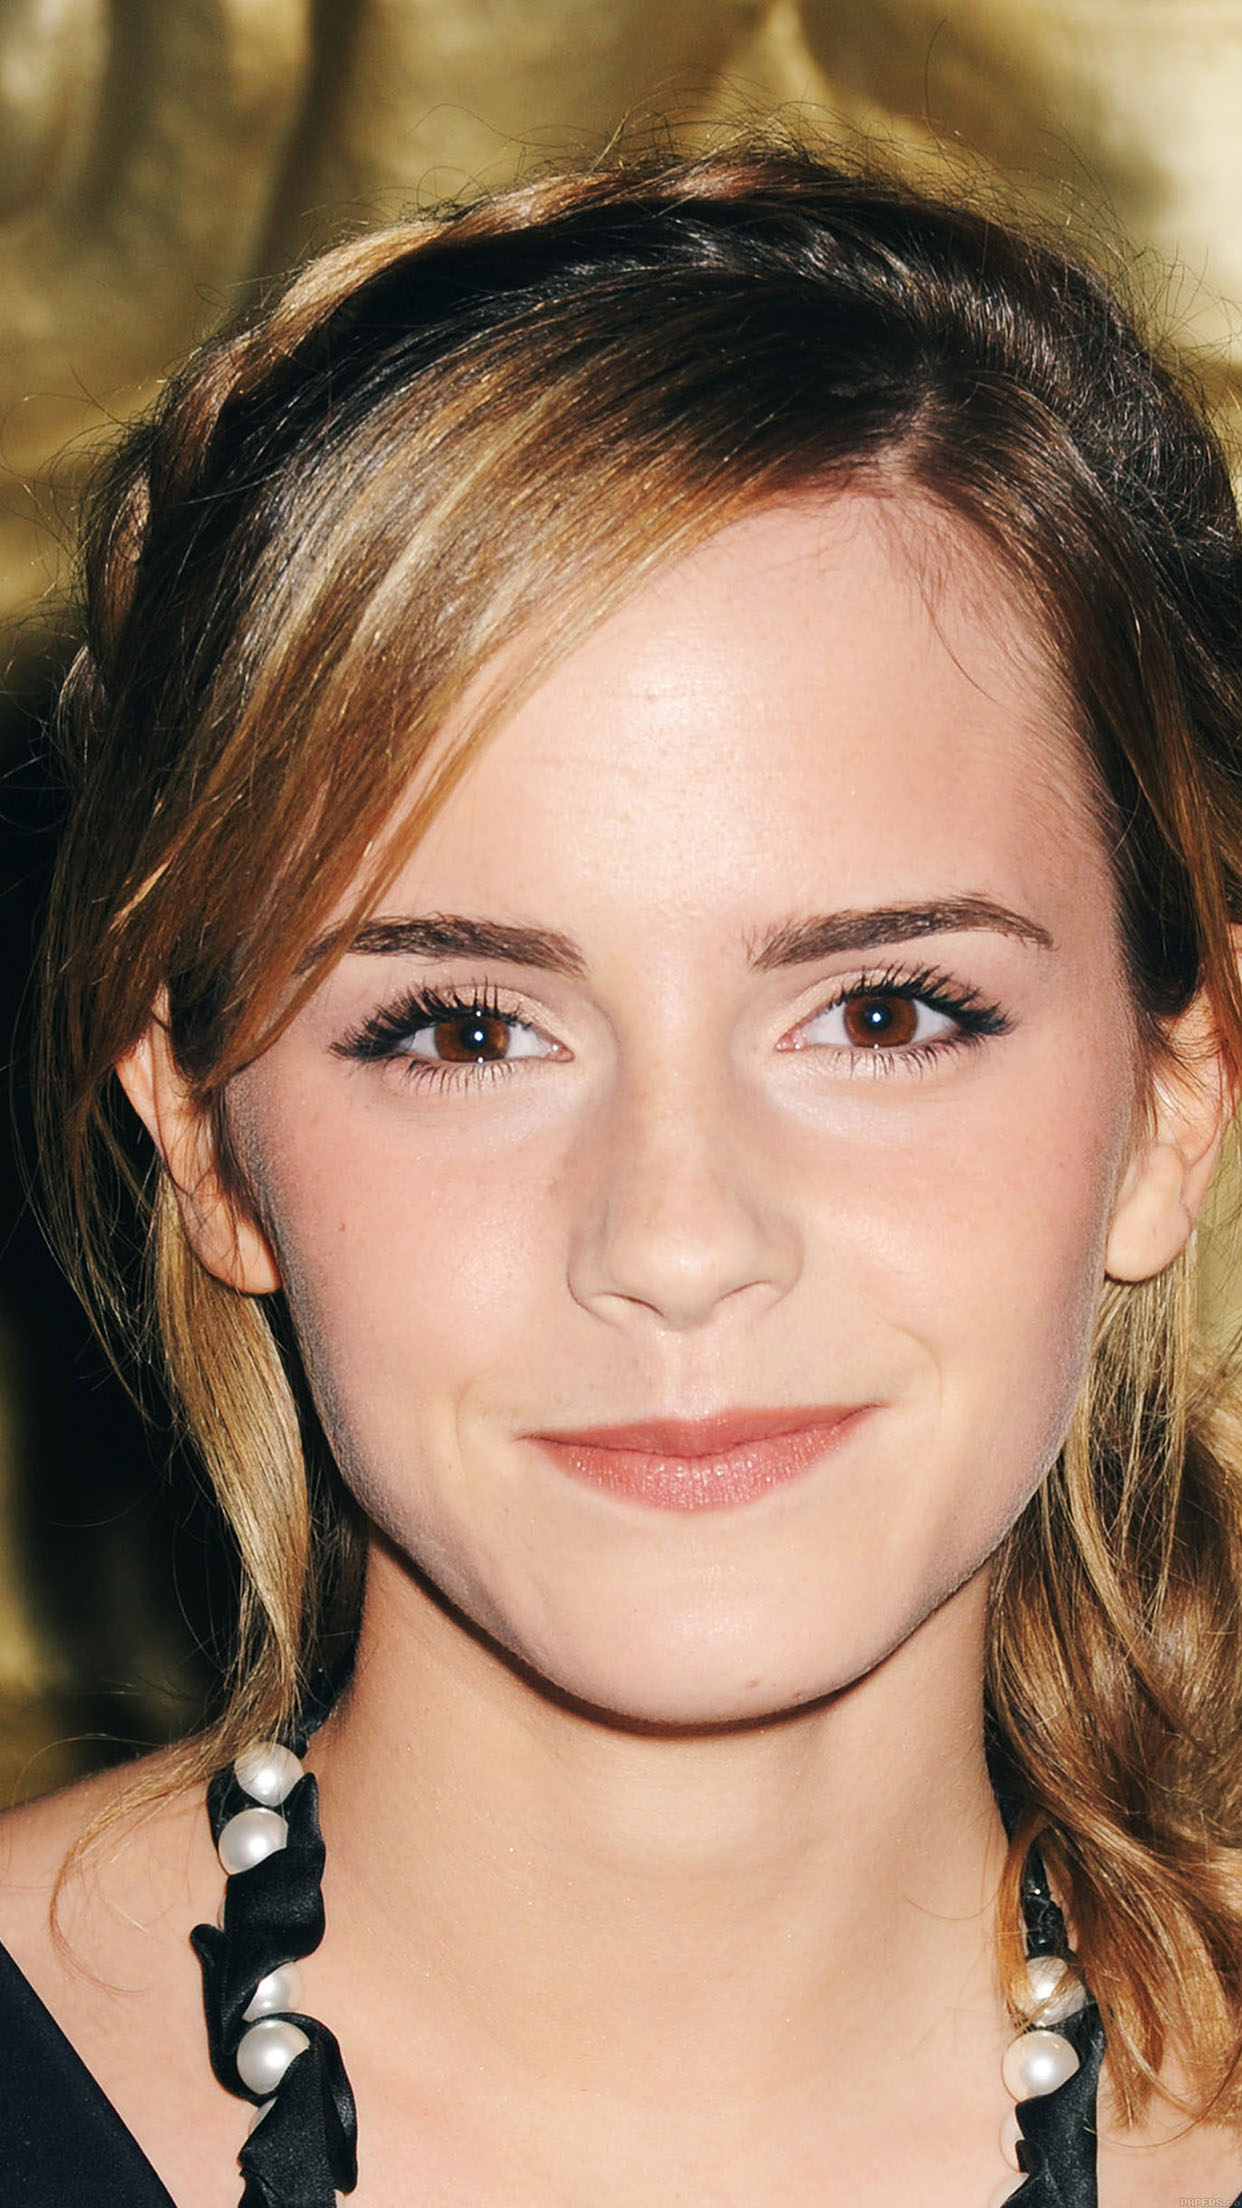 Cute Small Girl Hd Wallpaper Ha54 Wallpaper Emma Watson Dress Girl Face Papers Co